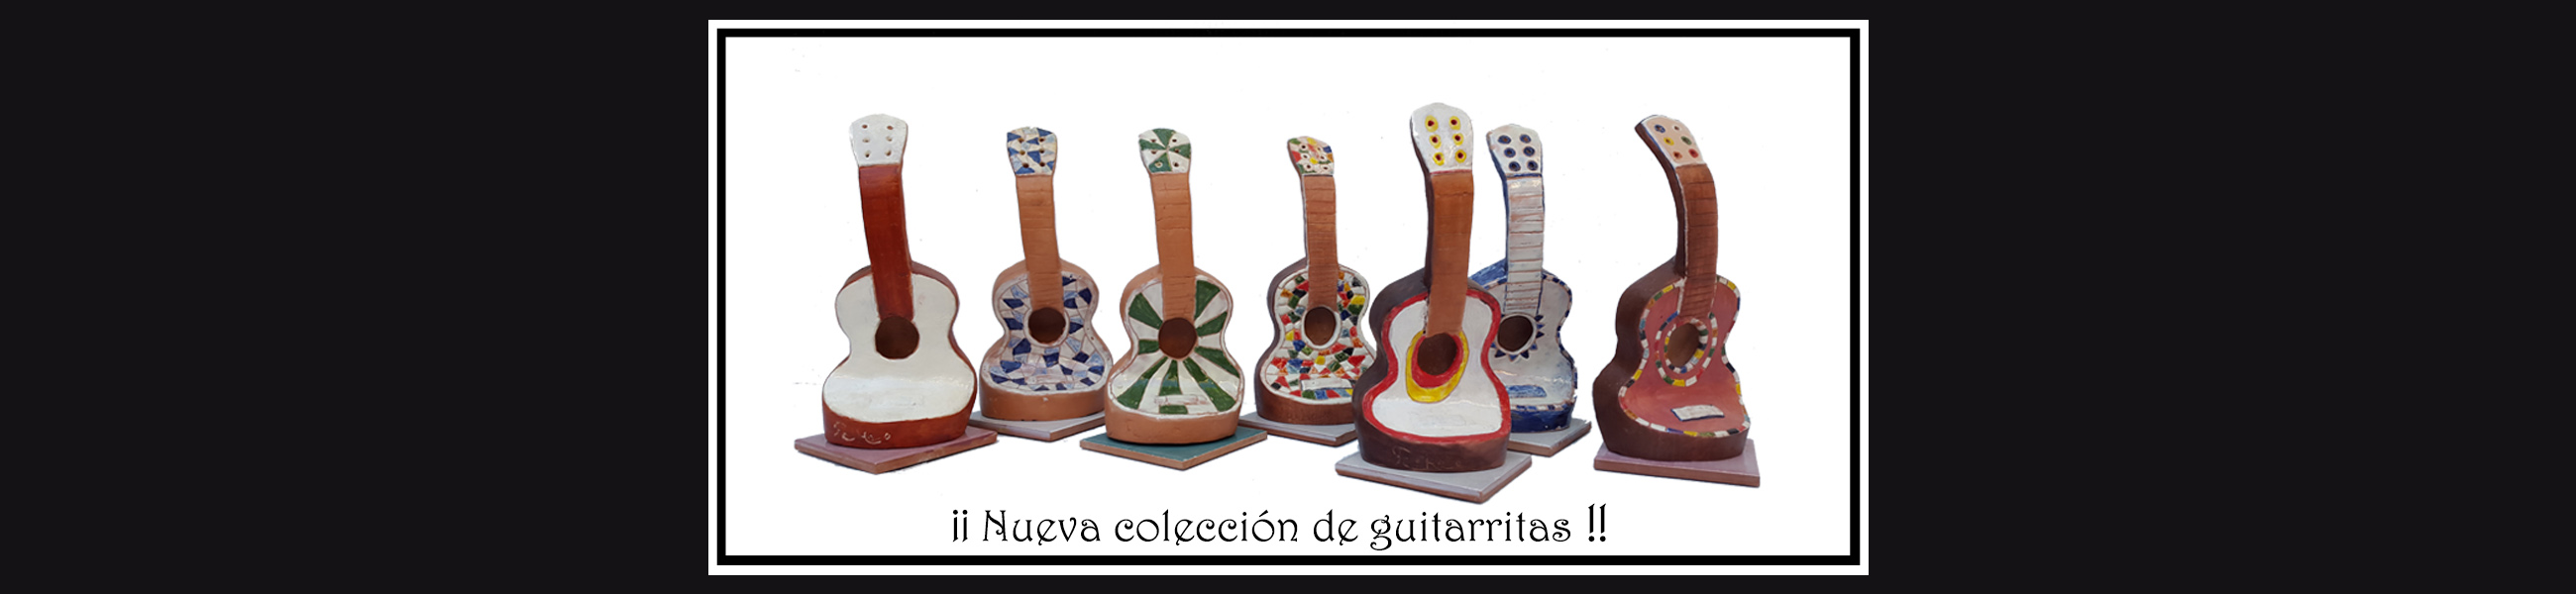 Fermin Hache coleccion guitarritas